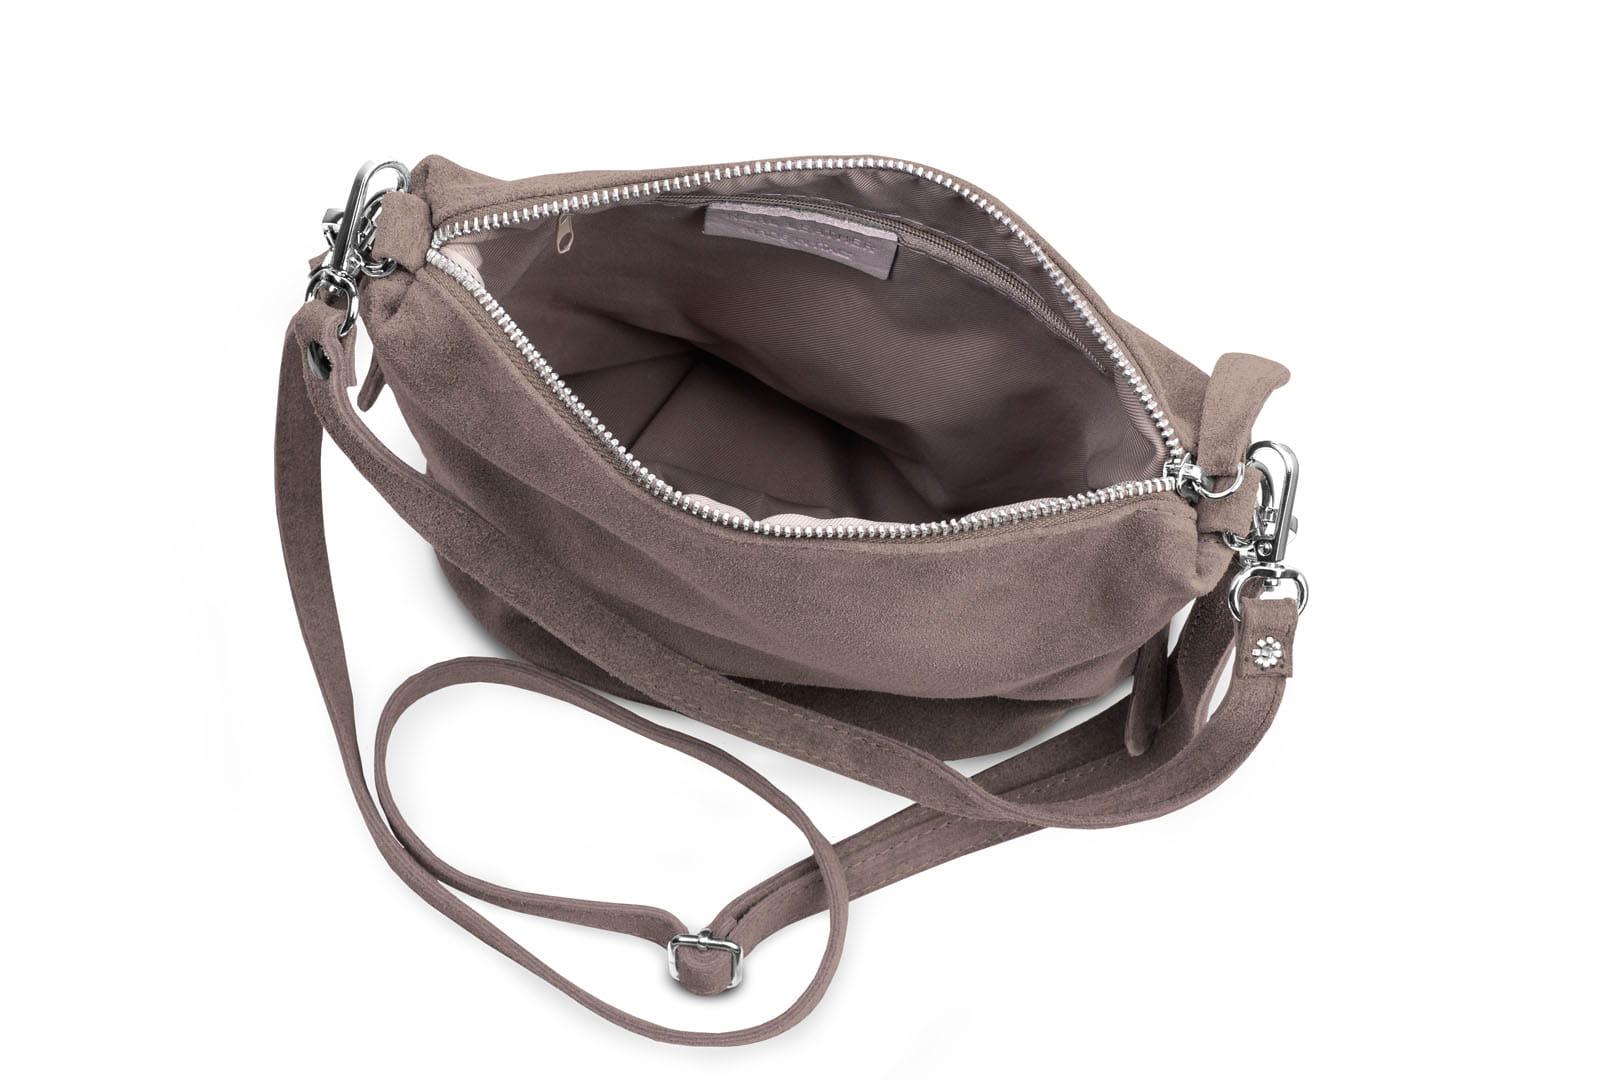 7e5f49013692a Torebka Damska Listonoszka Skórzana Vera Pelle Taupe Leather Box